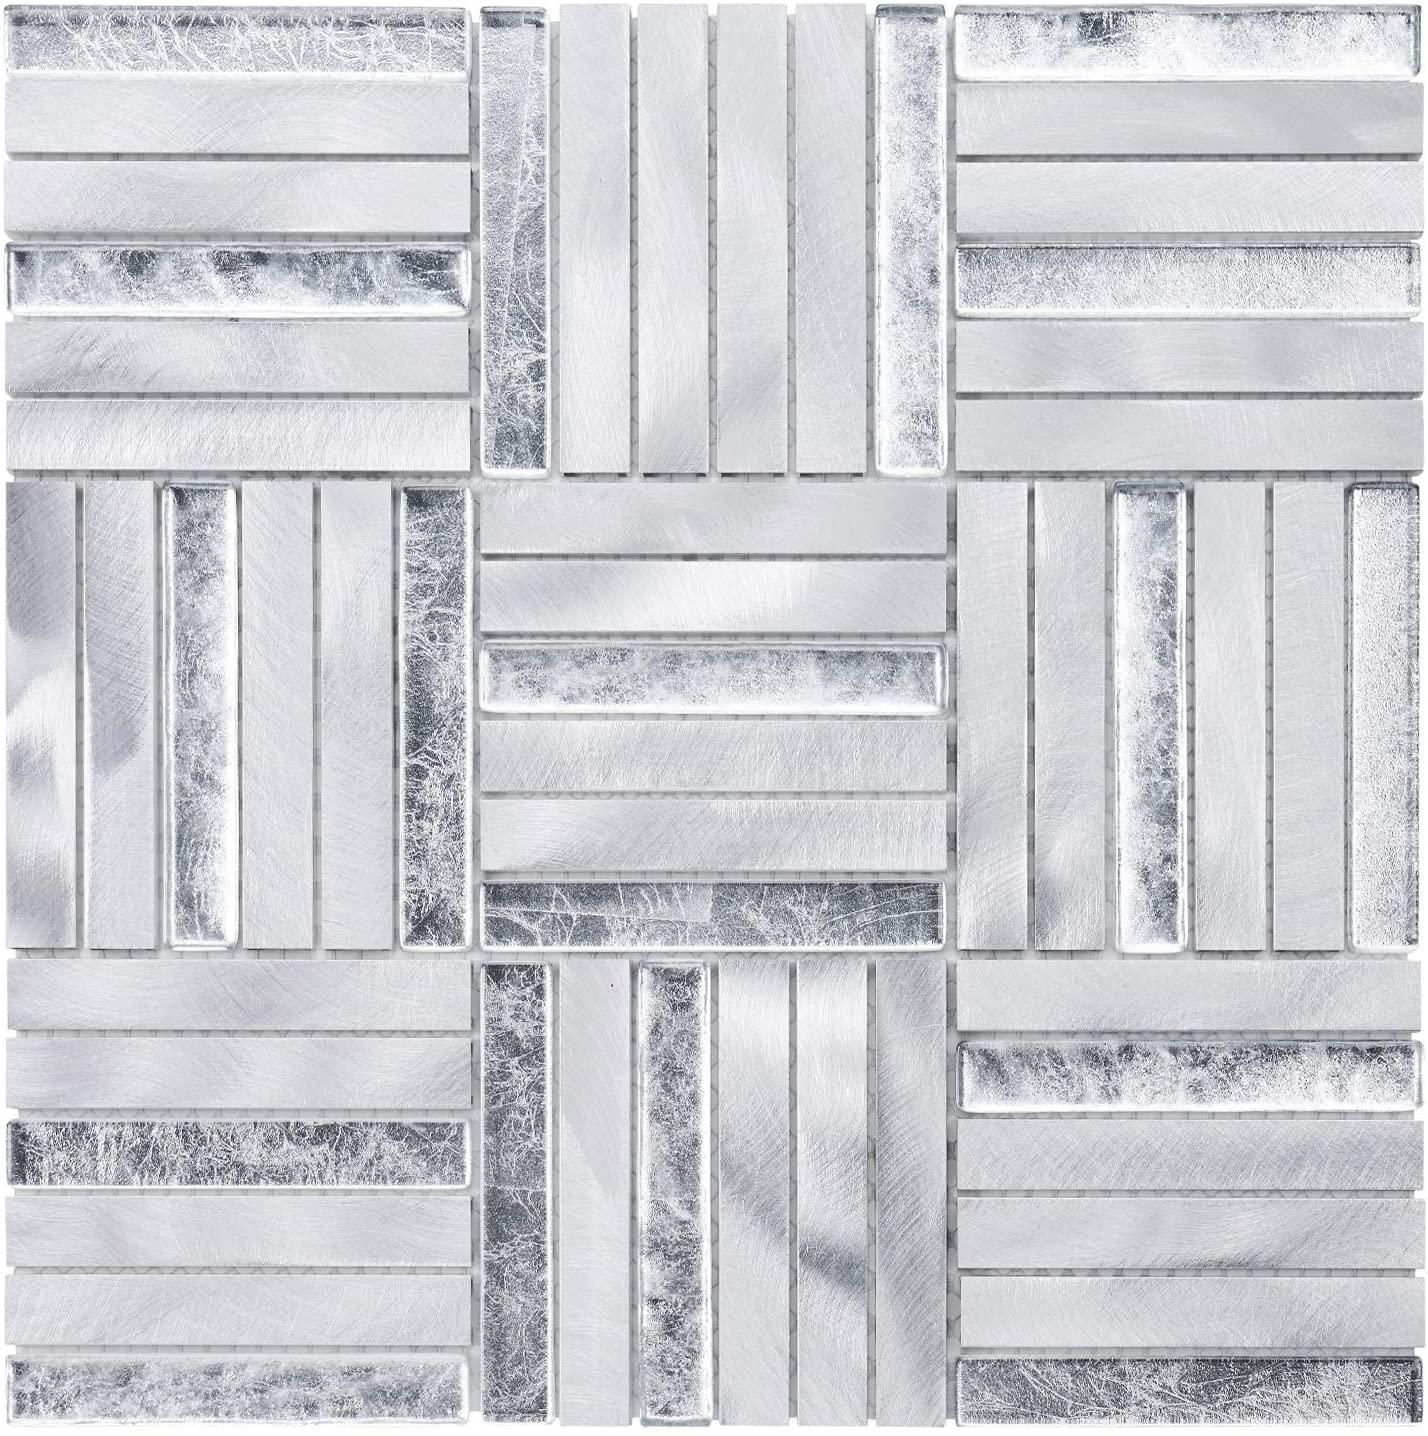 Modket TDH369AL Aluminum Metallic Metal Silver Foil Glass Insert Basketweave Parquet Modern Mosaic Tile Backsplash Kitchen Bath Bathroom Shower Interior Wall